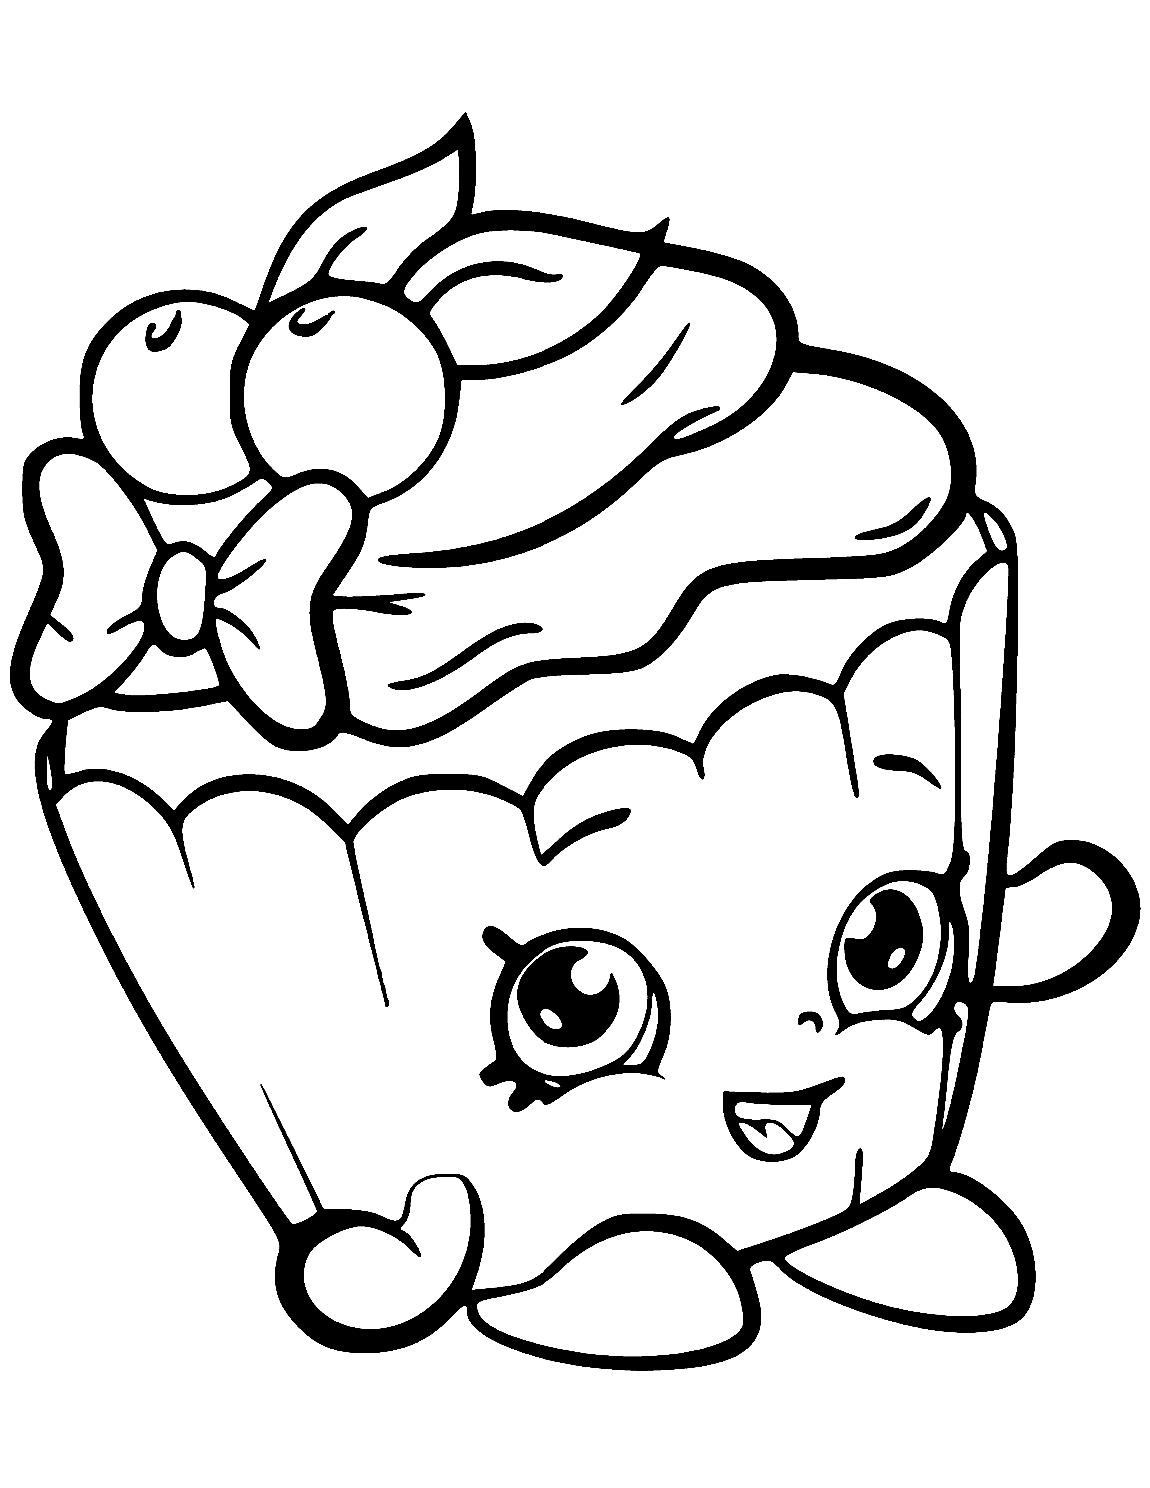 Cupcake Shopkins Cherry Nice Cupcake Coloring Page